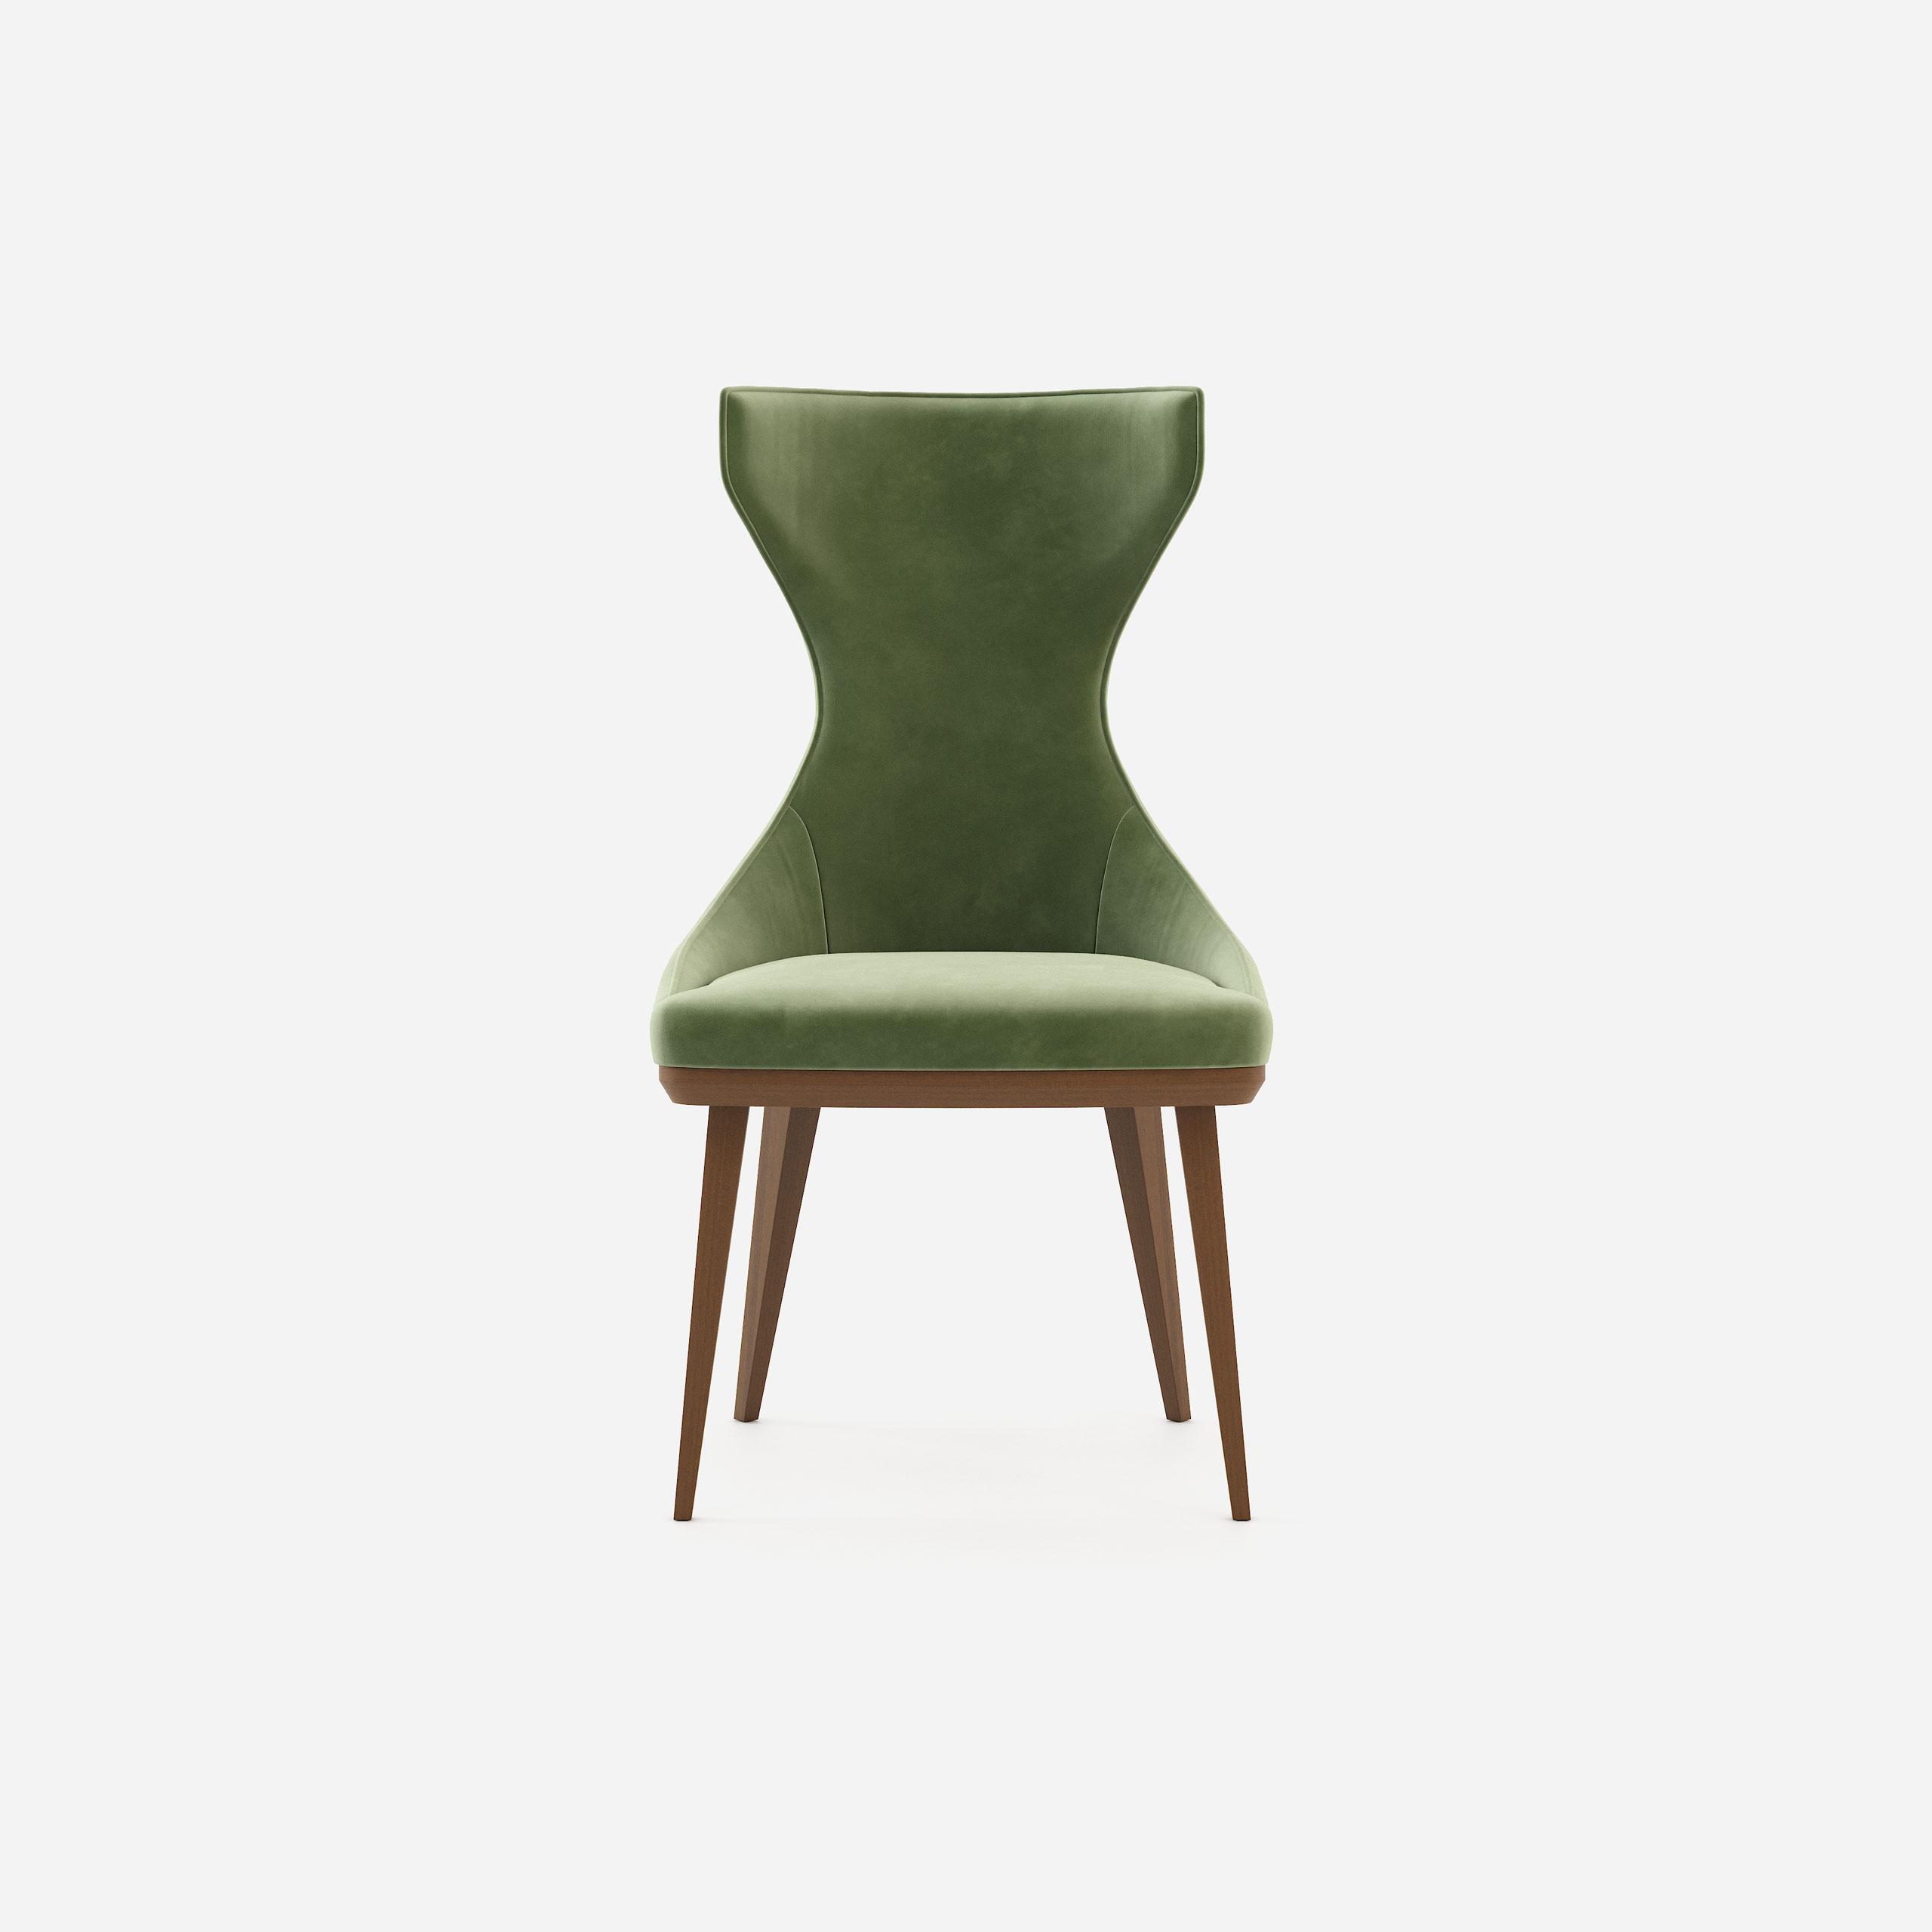 jones-cadeira-domkapa-oldest-designs